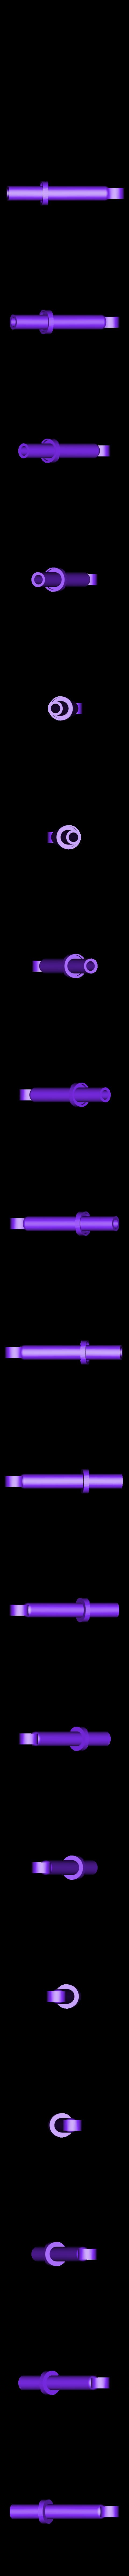 voor_veerboven.stl Download free STL file trick (custom) • 3D printer model, jasperbaudoin